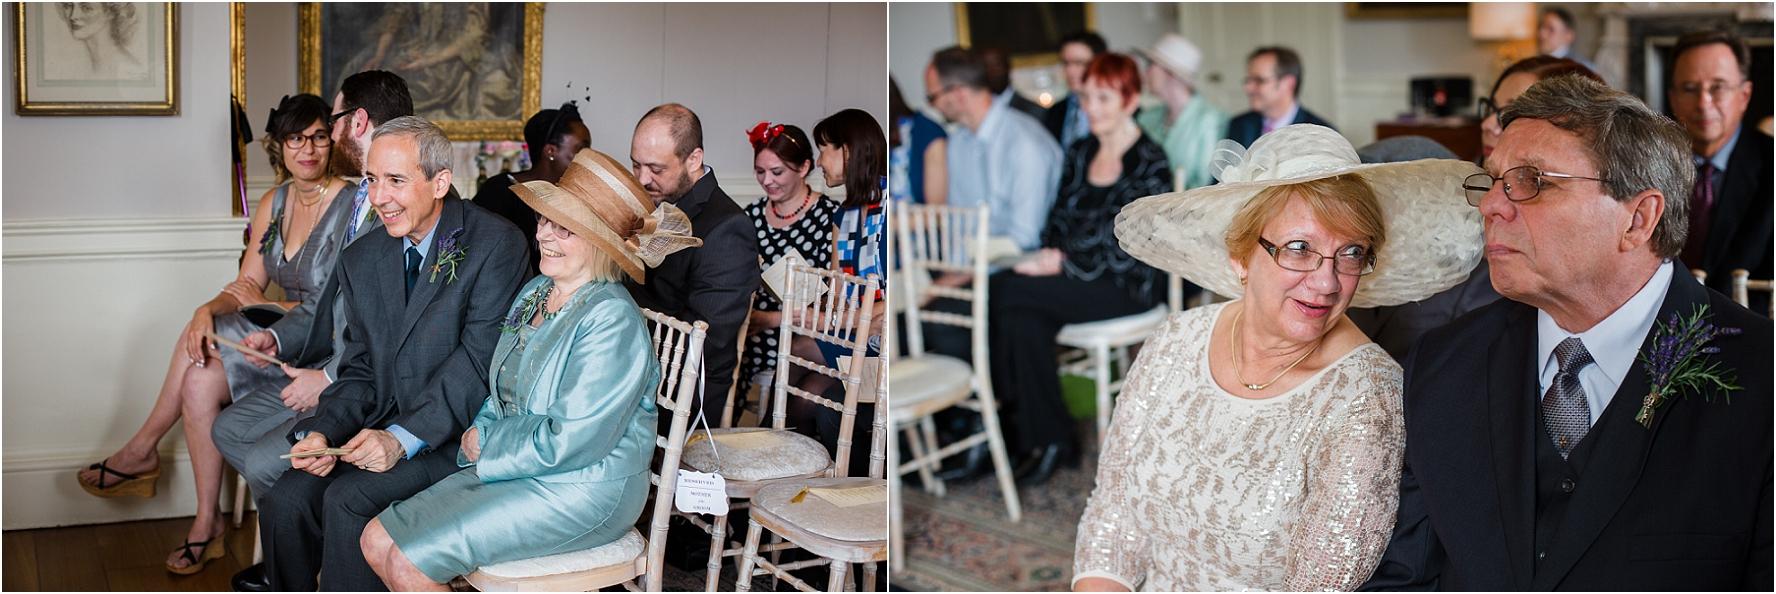 wedding-photography-the-orangery-settringham_0422